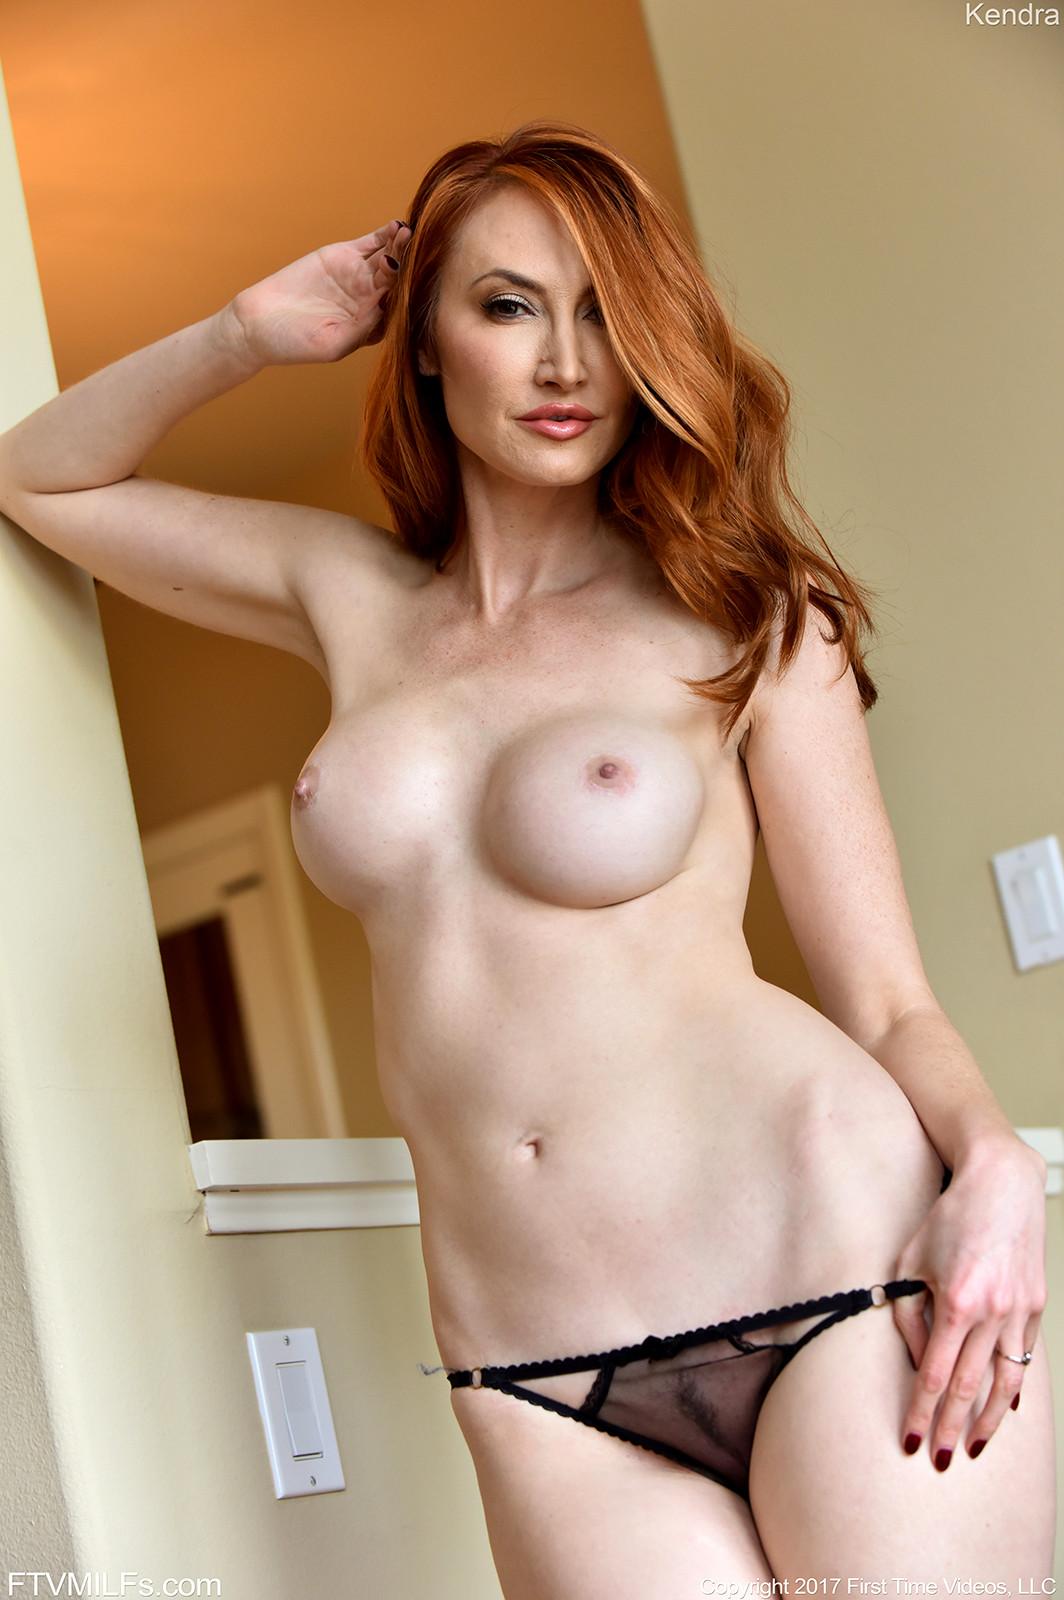 Ftvmilfs Kendra James Gril Redhead Uncovered Free Pornpics -2674